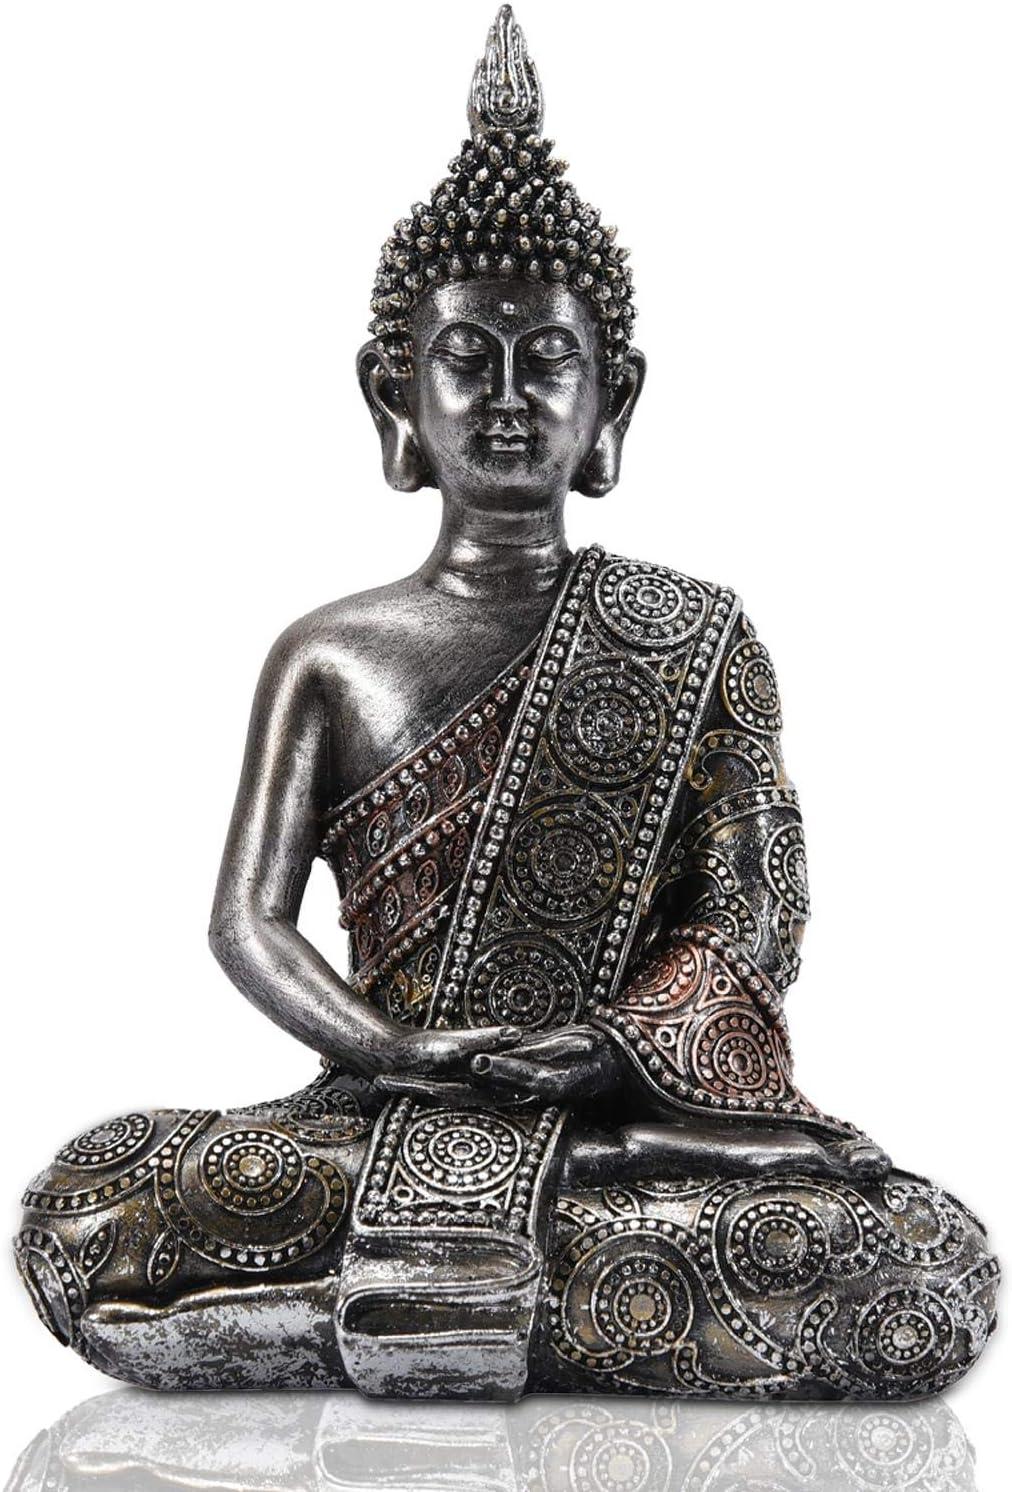 Nacome Meditating Quantity limited Thai Buddha Zen Statue Over item handling Garden Figurine